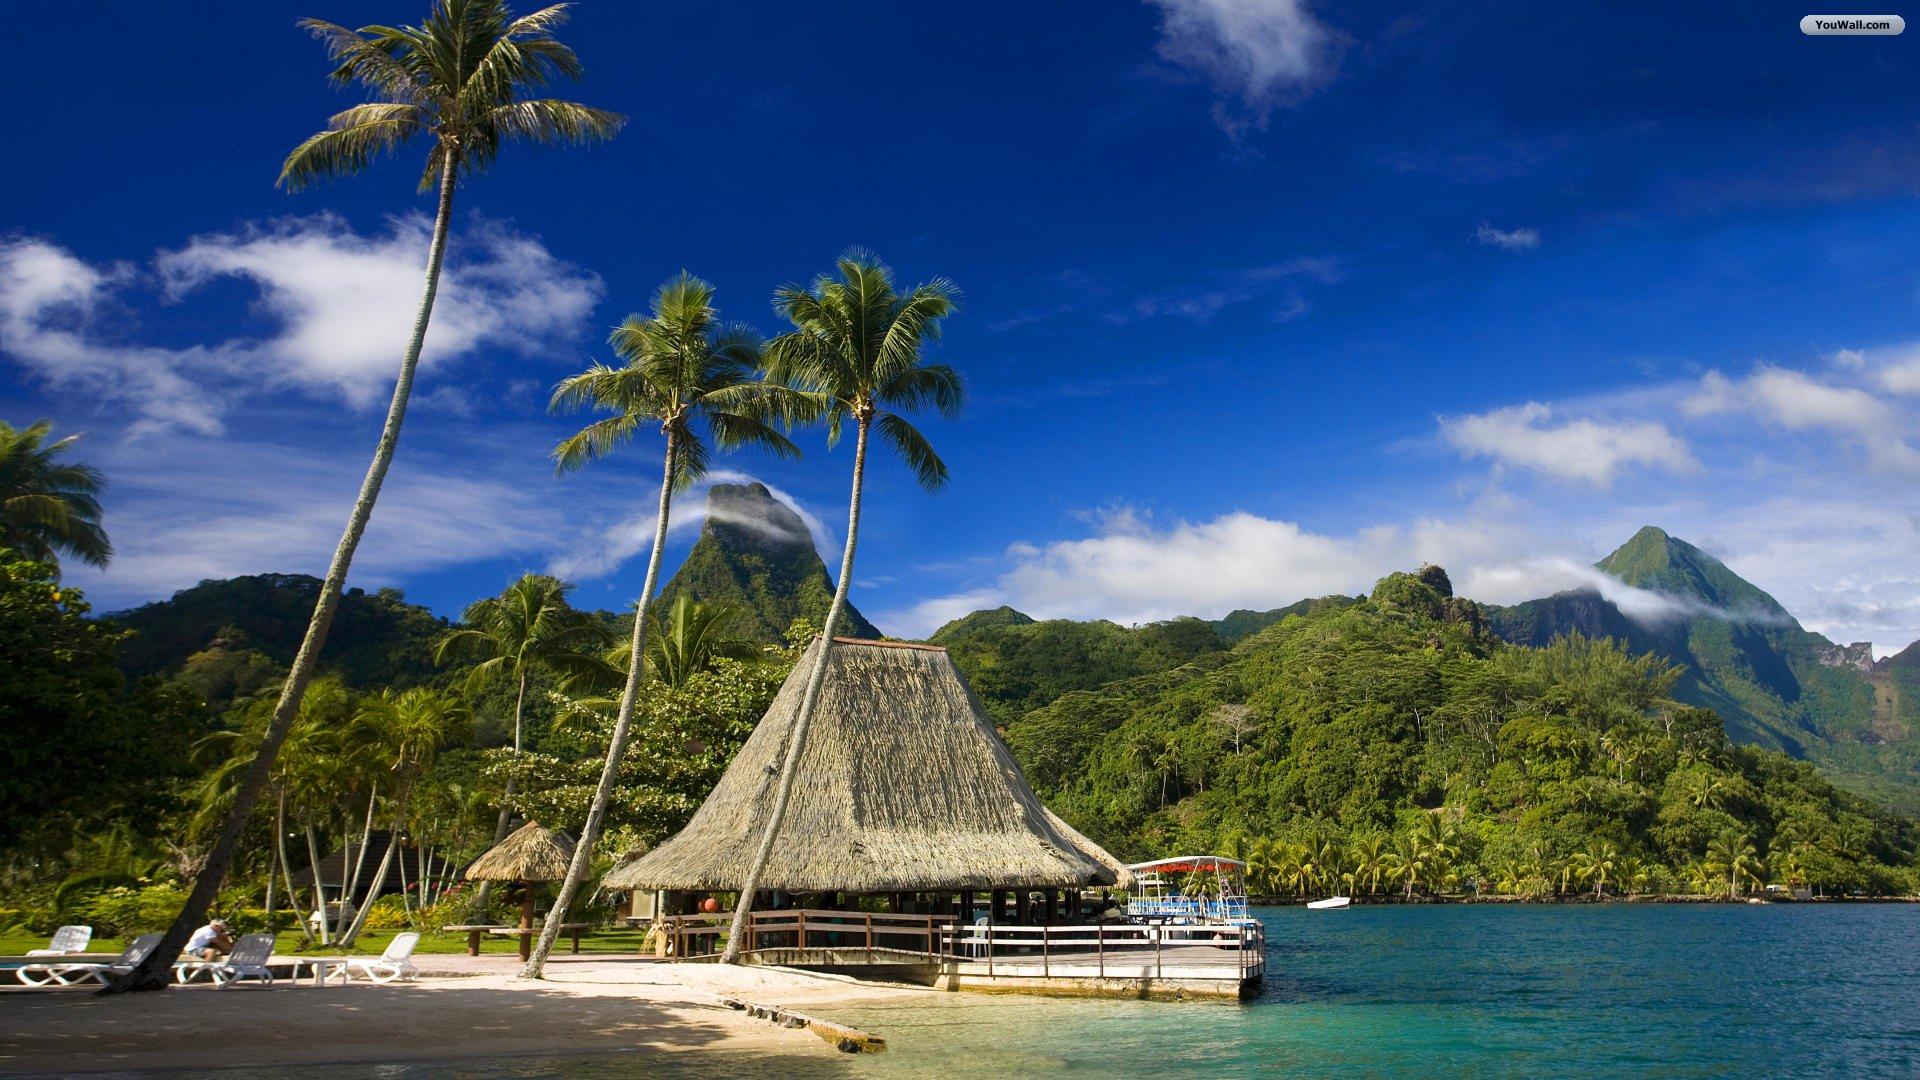 Tropical Paradise Wallpaper High Resolution: Island HD Wallpaper